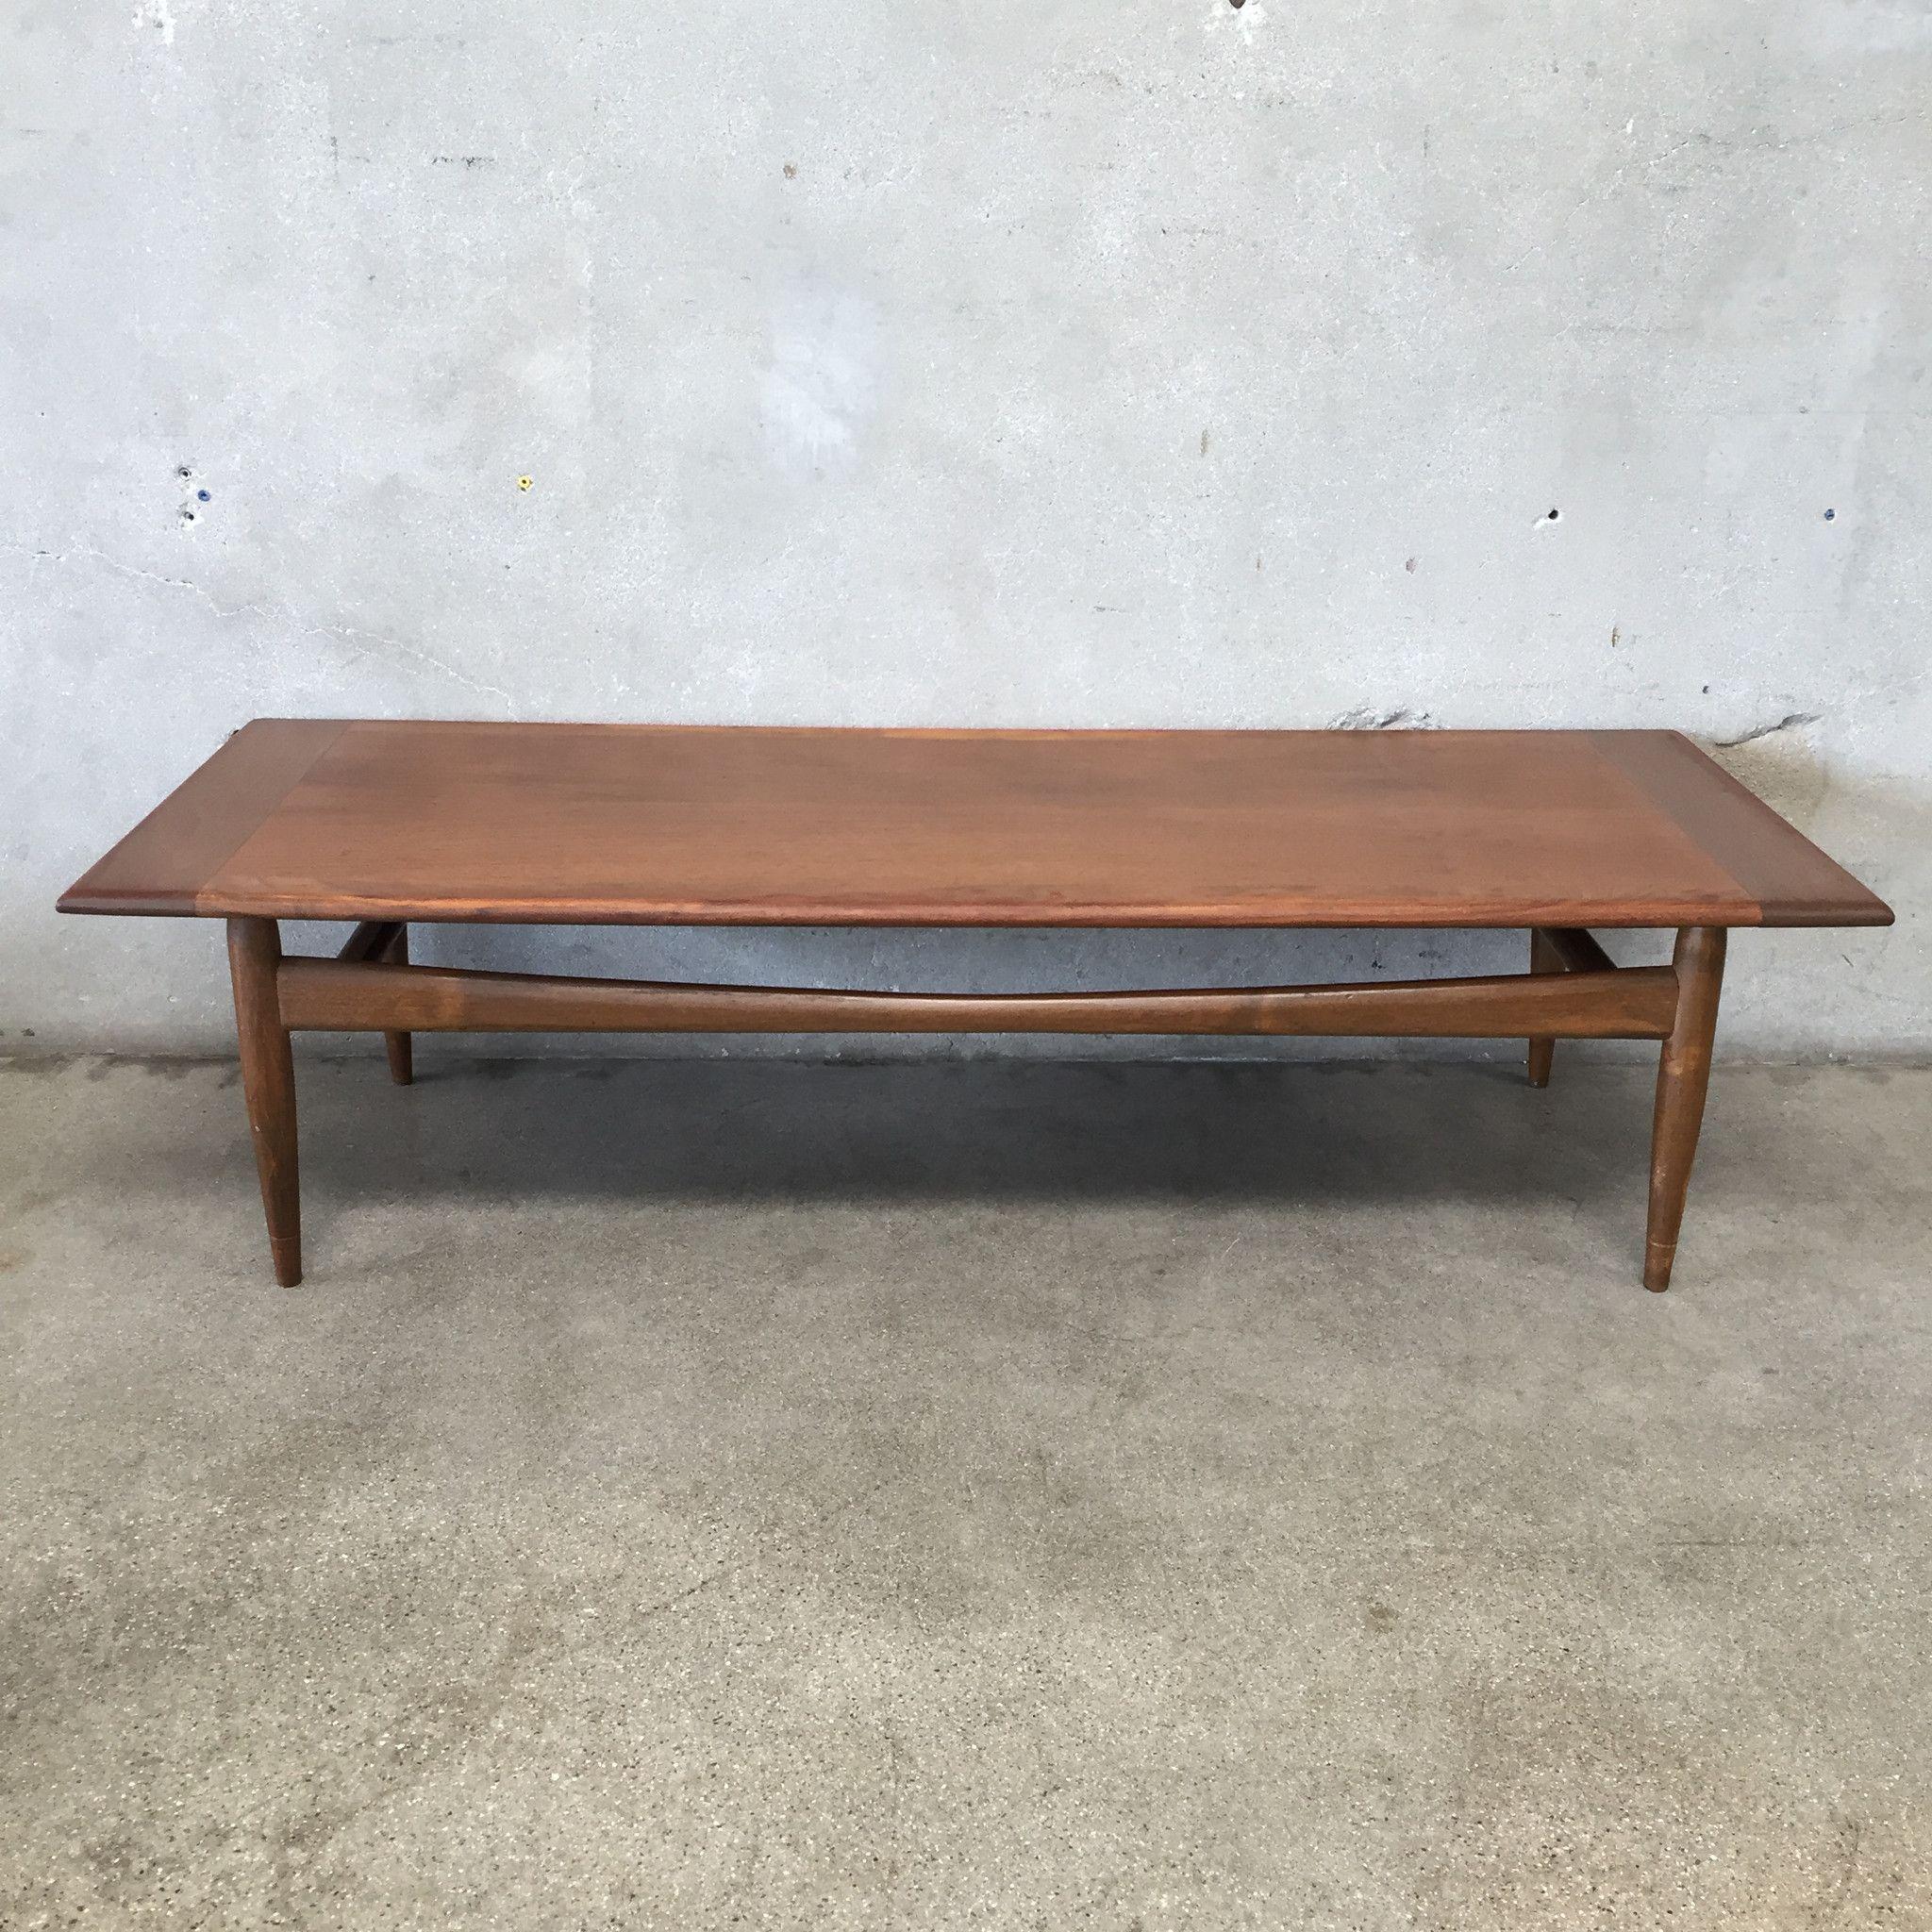 Mid Century Danish Modern Coffee Table 14 X 54 X 20 Danish Modern Danish Modern Table Furniture [ 2048 x 2048 Pixel ]